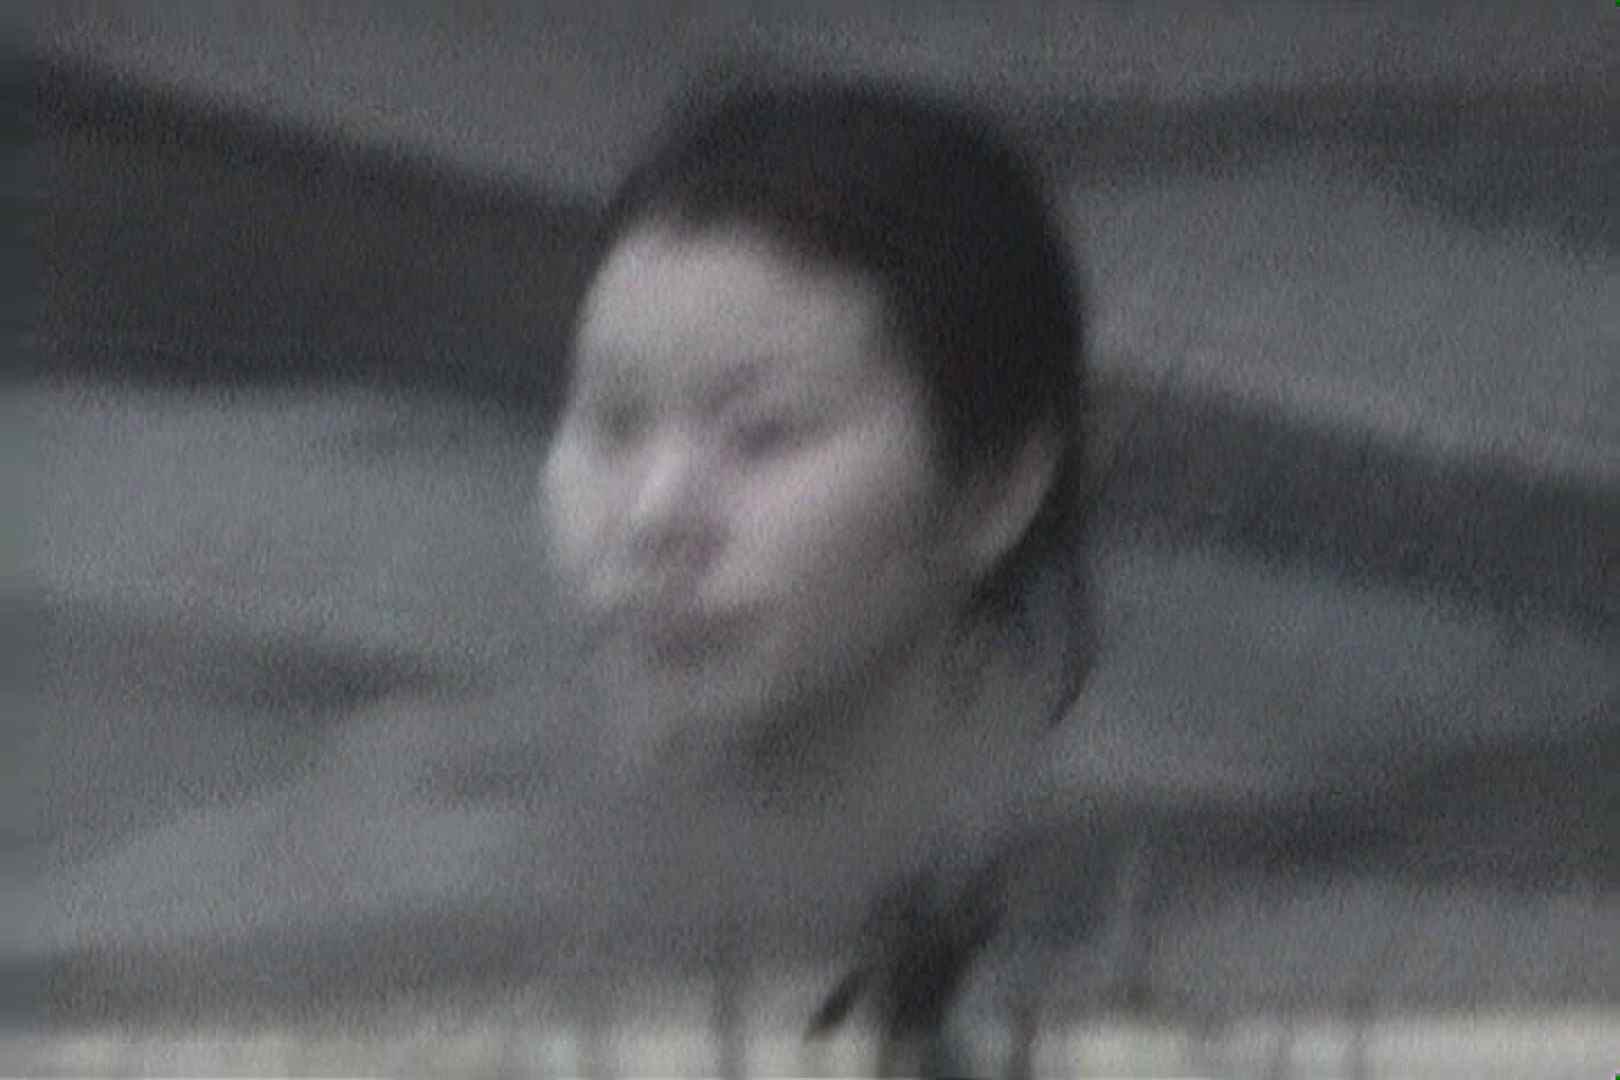 Aquaな露天風呂Vol.556 露天風呂編  99PIX 92